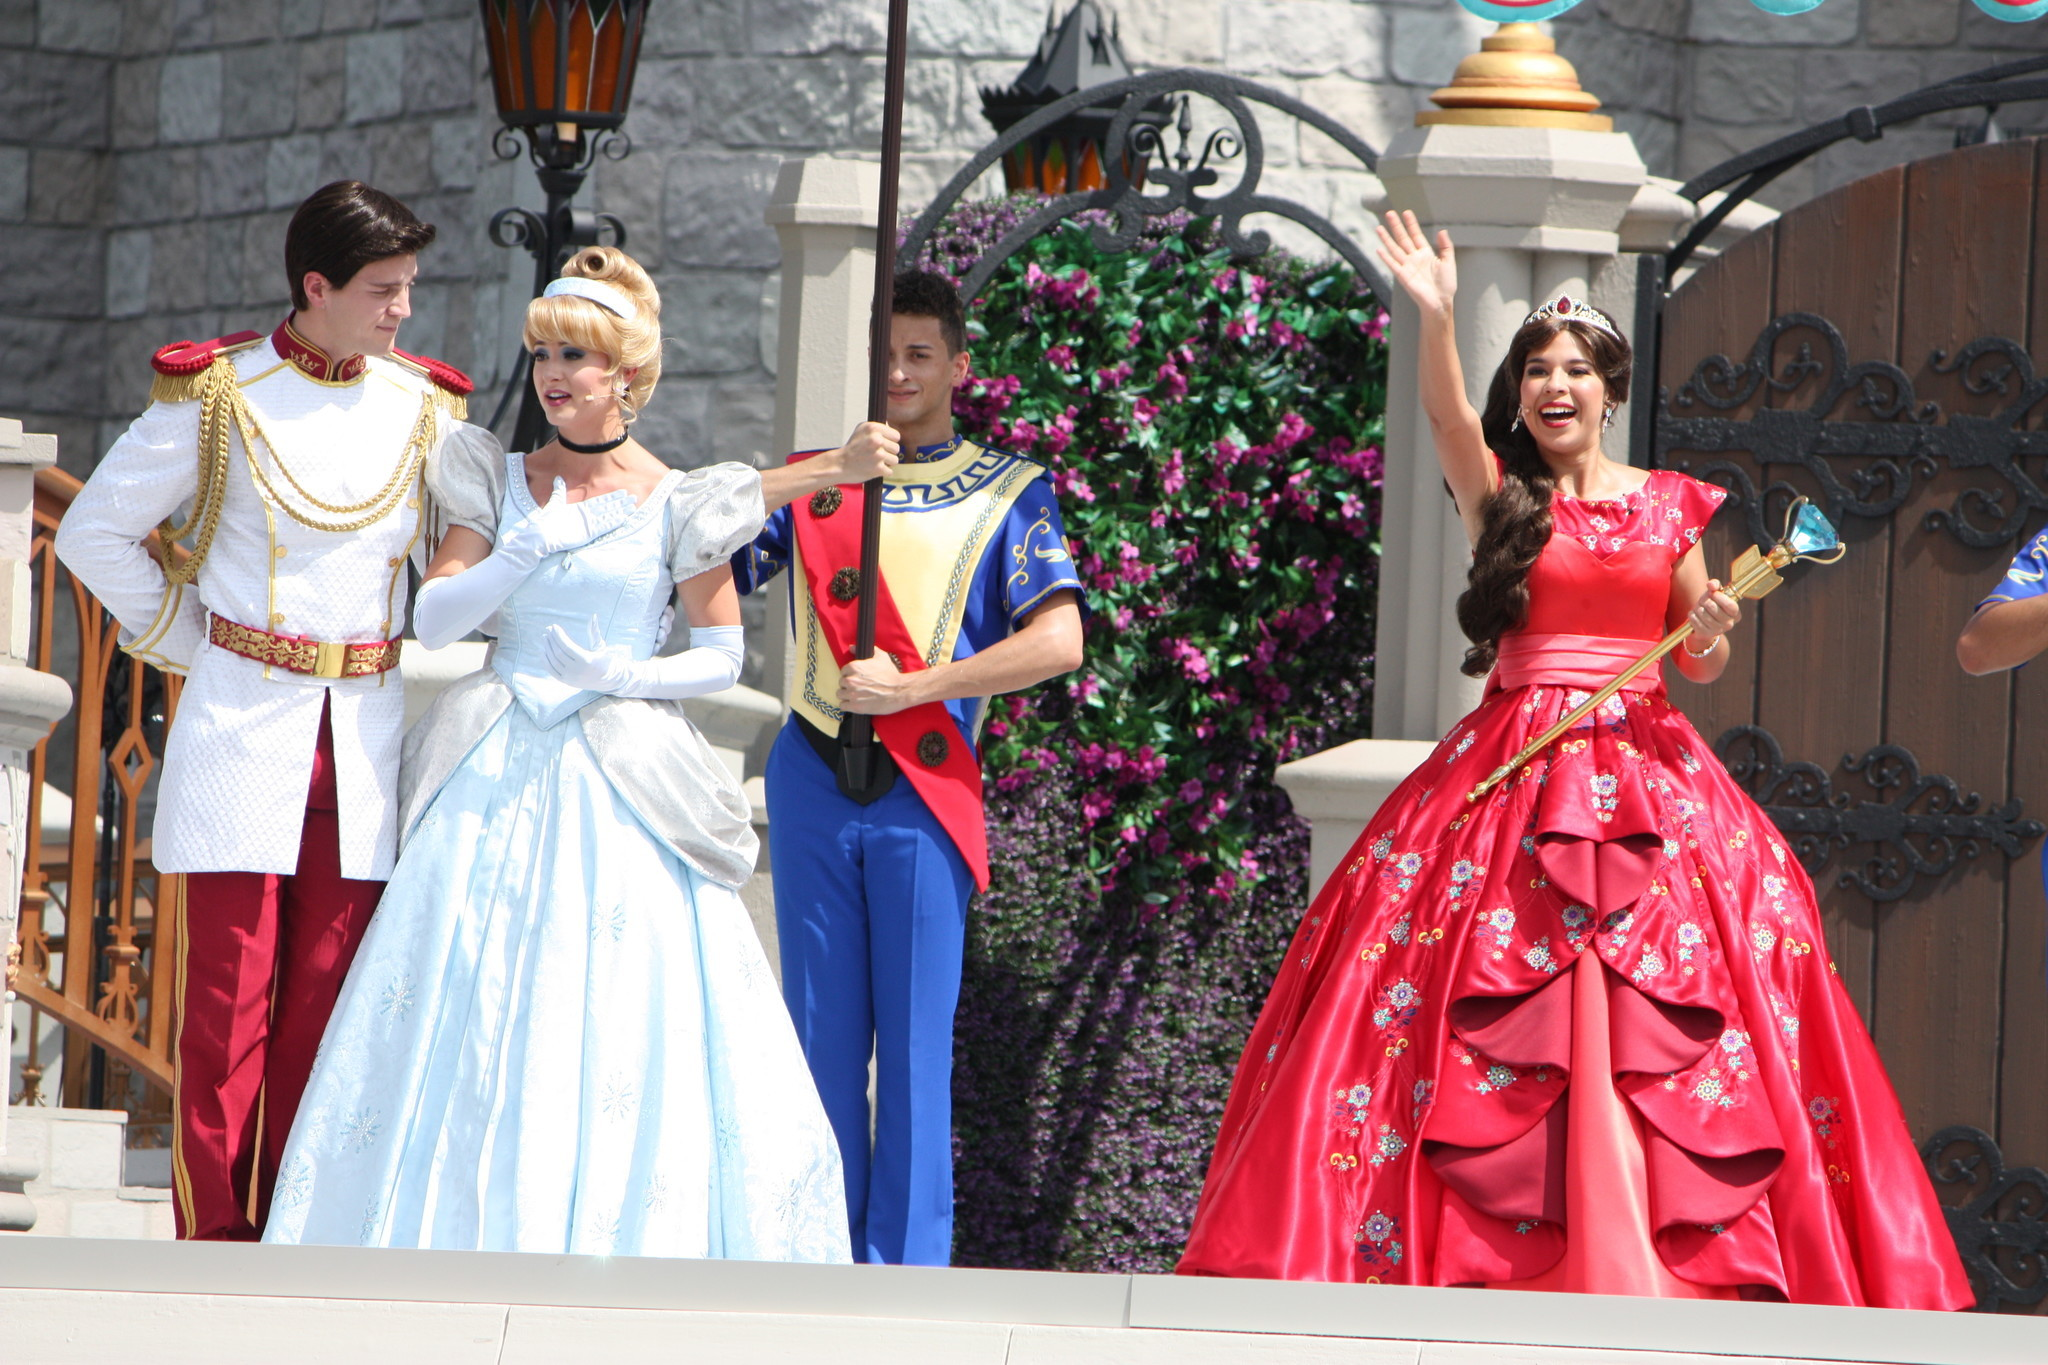 Elena of Avalor Season 2 renewed